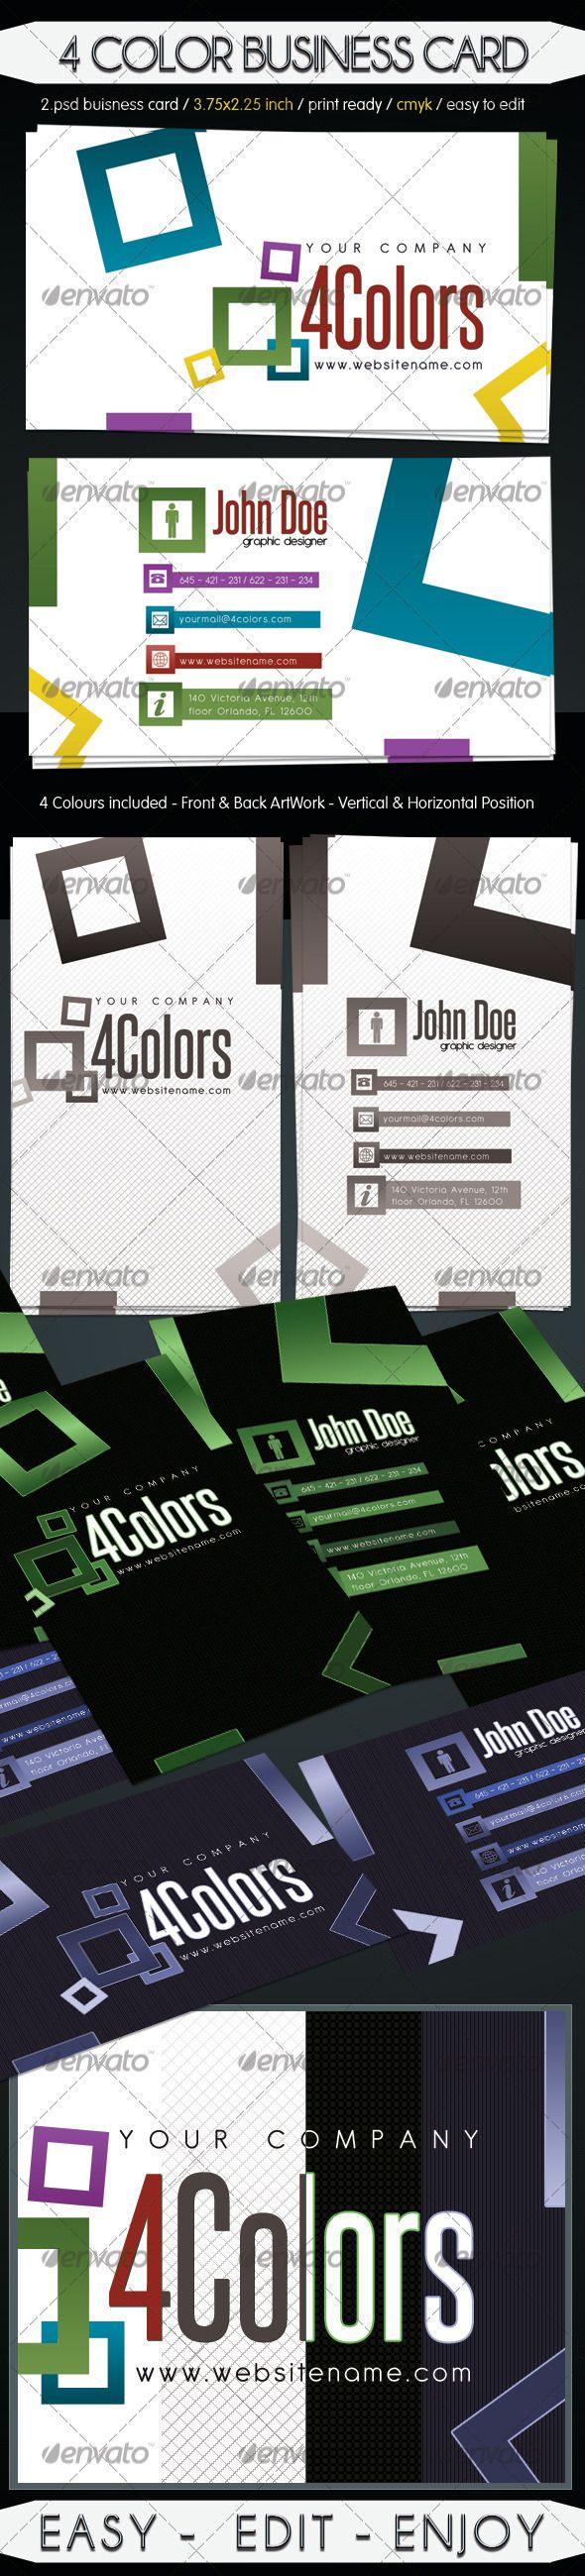 173 best Print Templates images on Pinterest | Print templates, Font ...